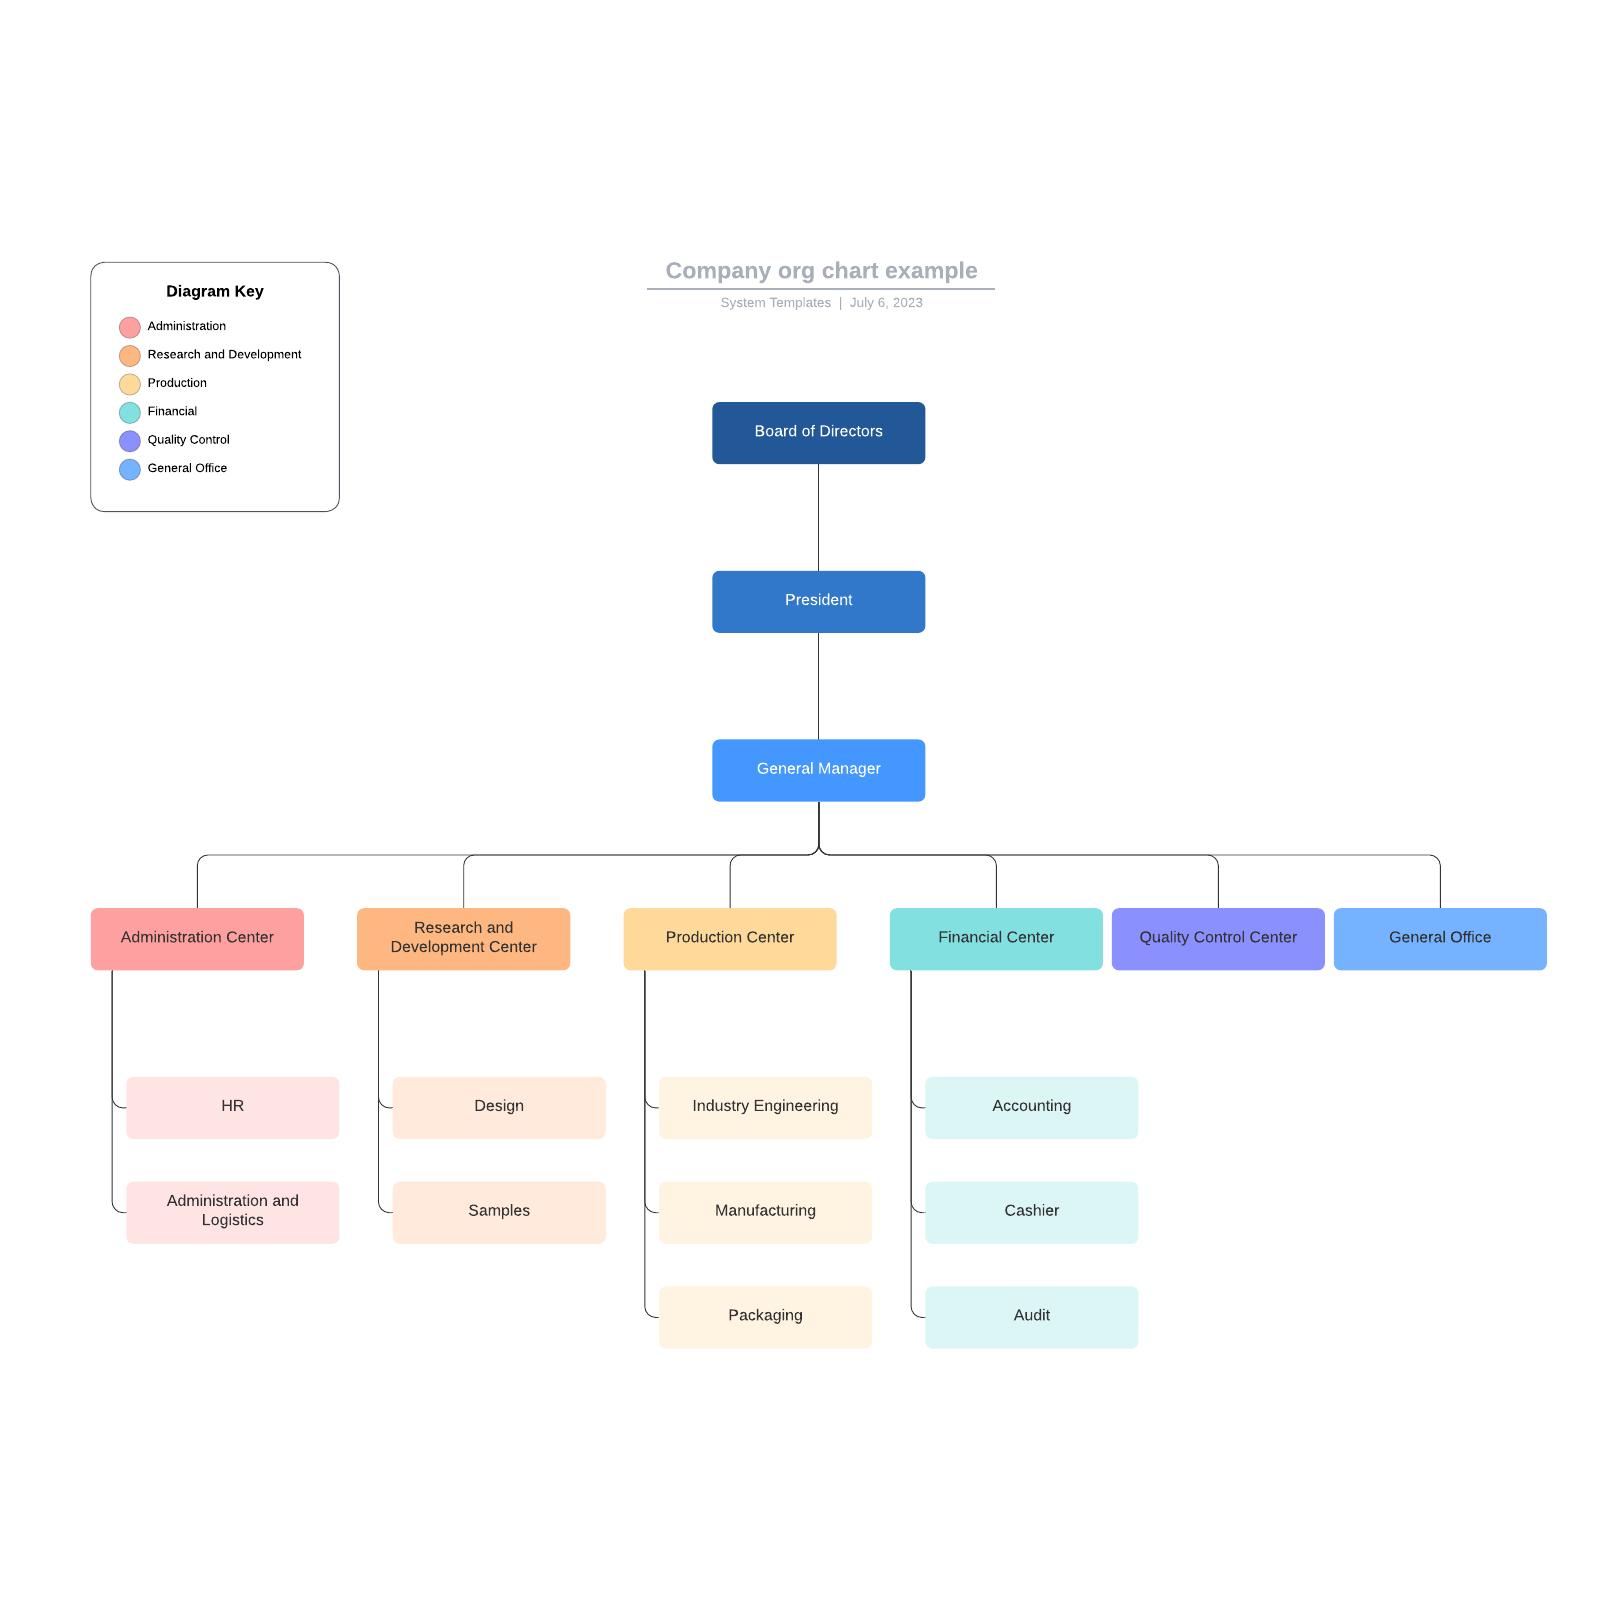 Company org chart example